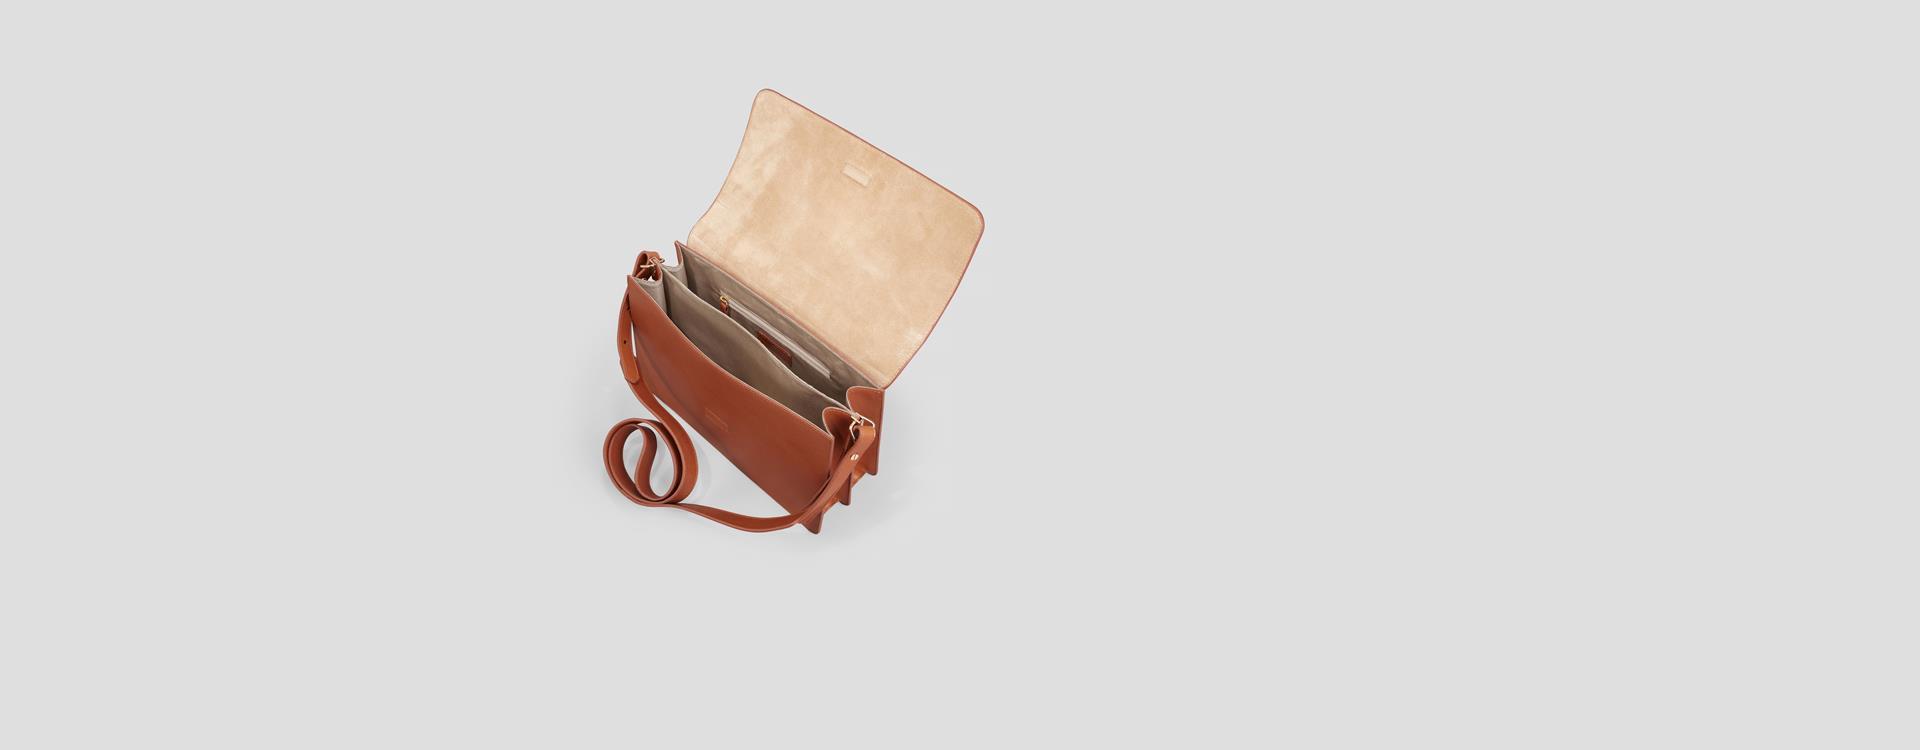 Virginia Leather Bag Brown Vagabond